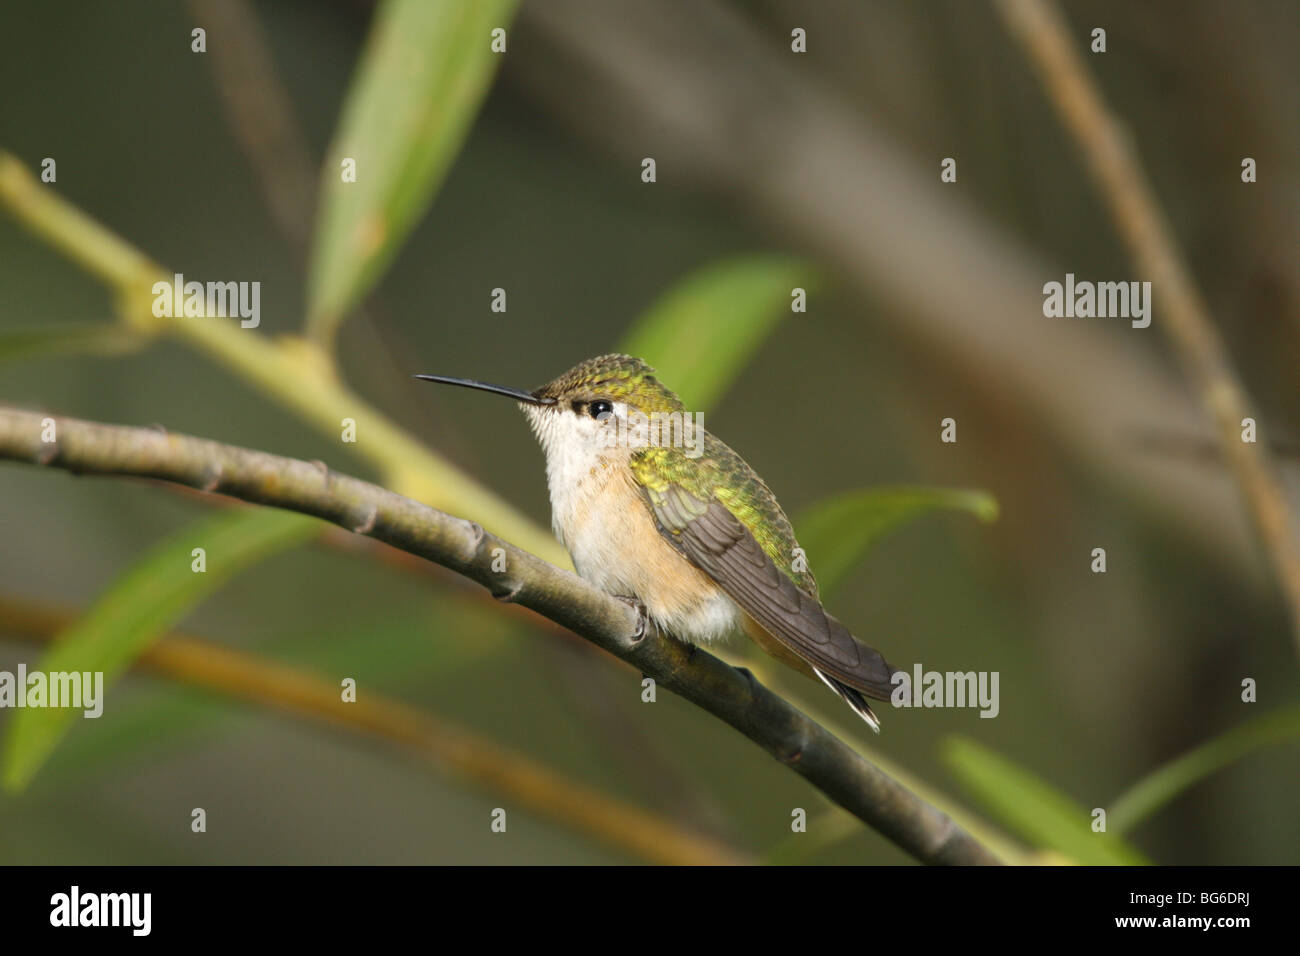 The smallest hummingbird in North America, a female Calliope Hummingbird perches on a branch near a hummingbird - Stock Image